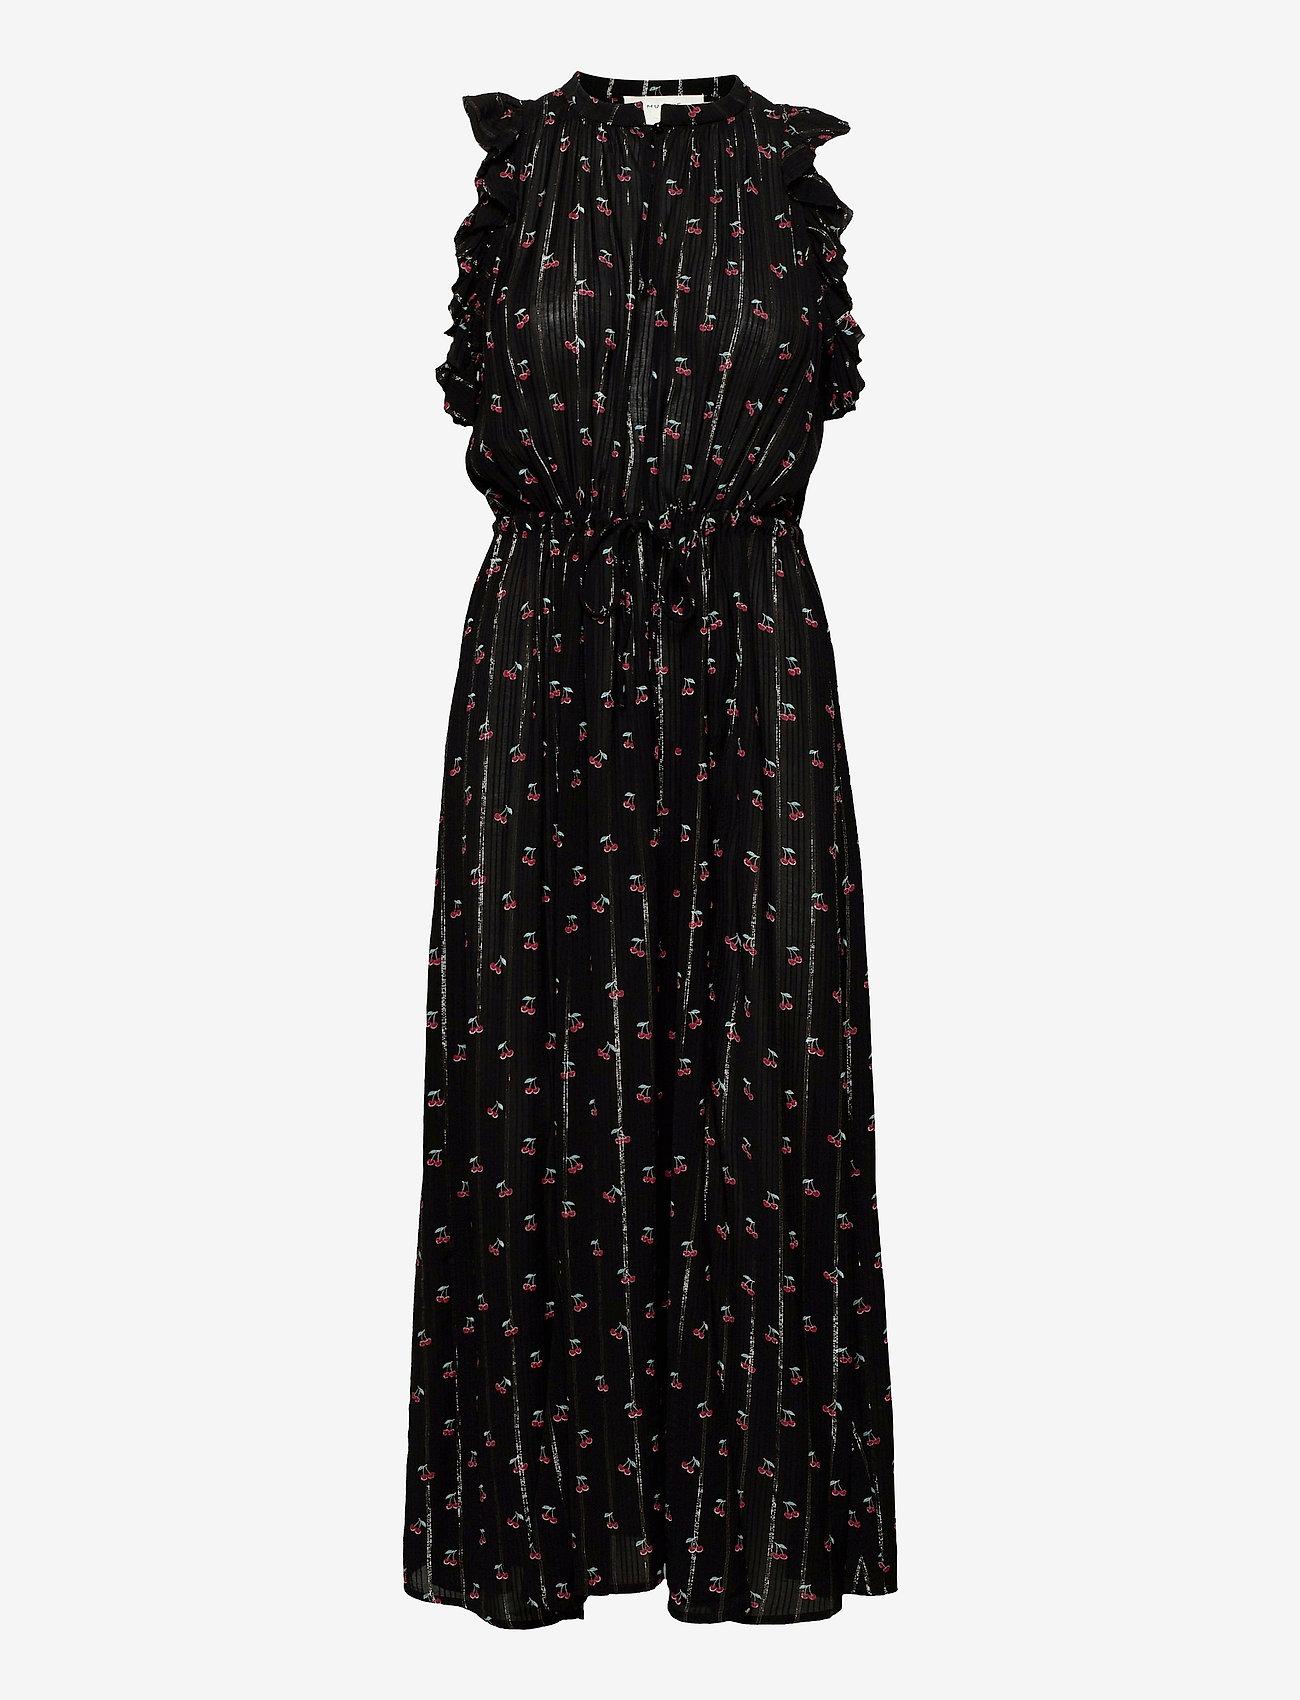 Munthe - PARSLEY - maxi dresses - black - 1